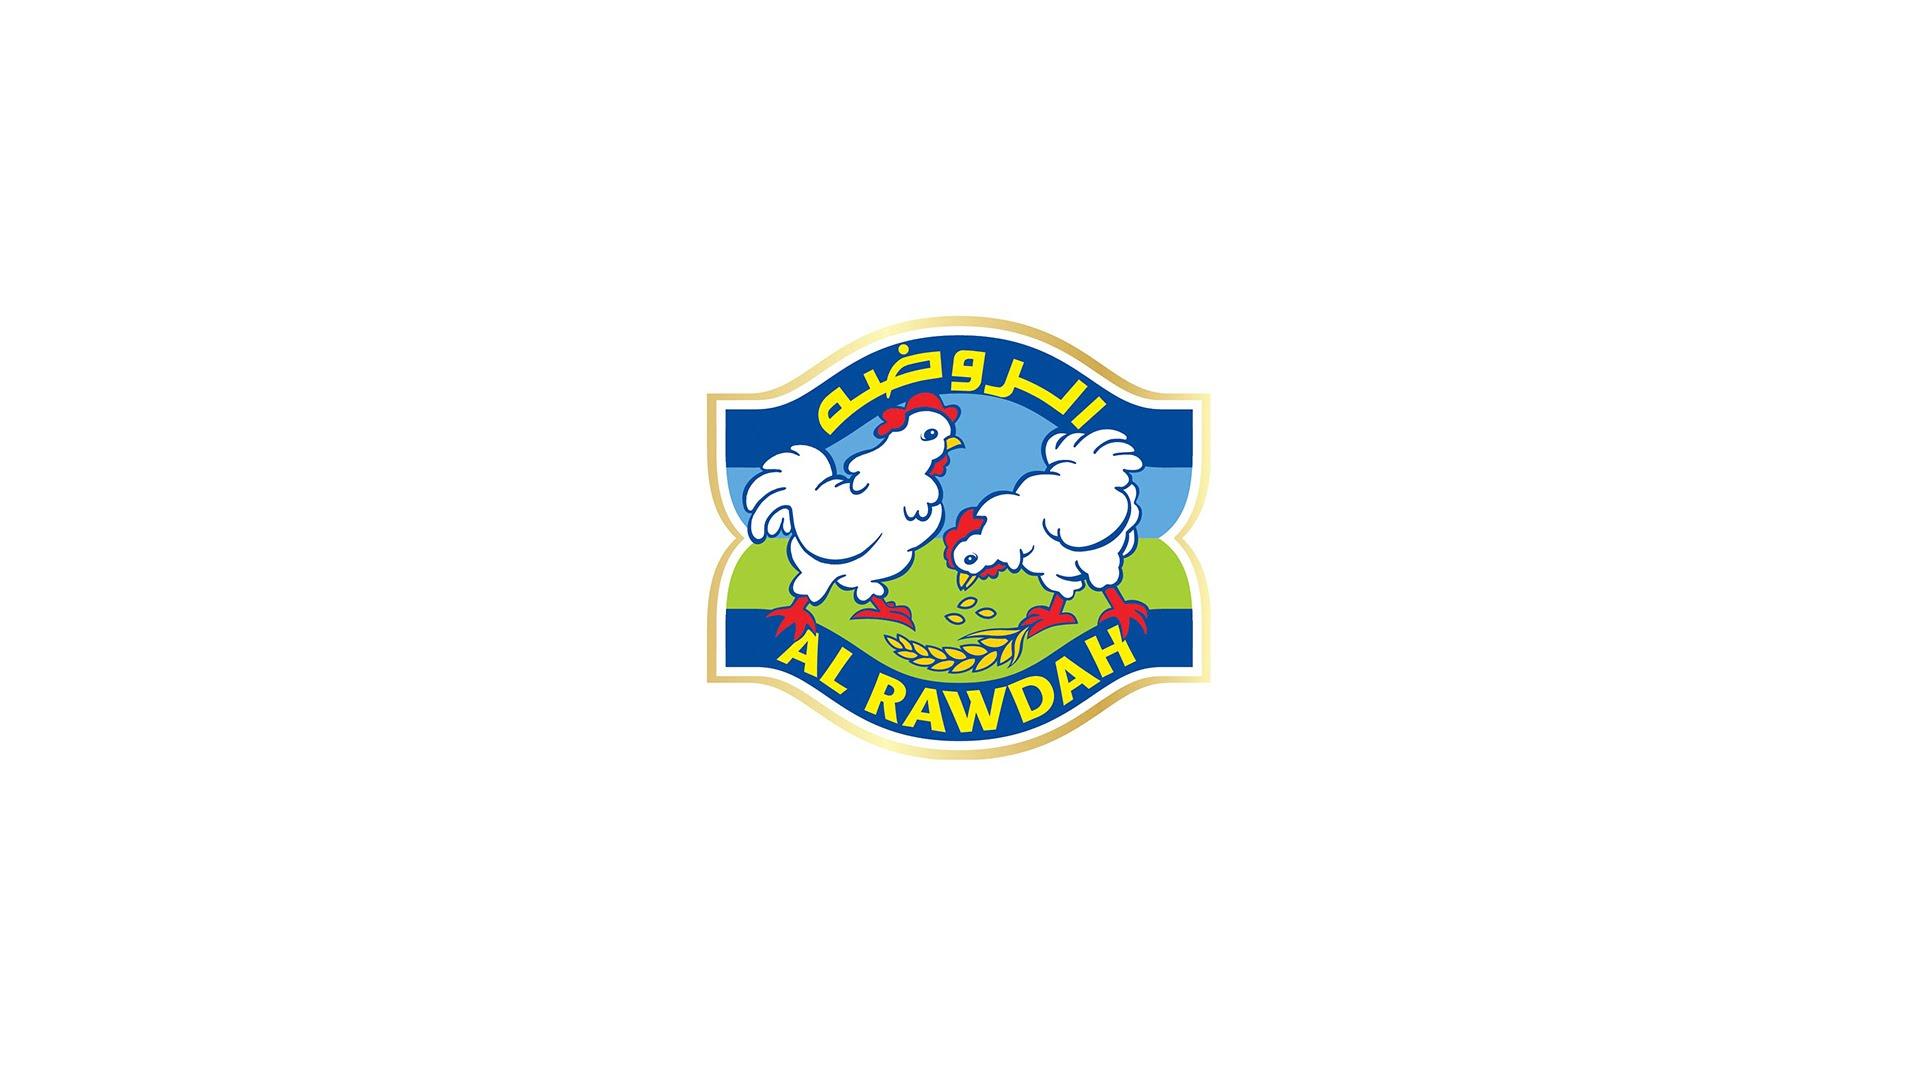 Al rawadah